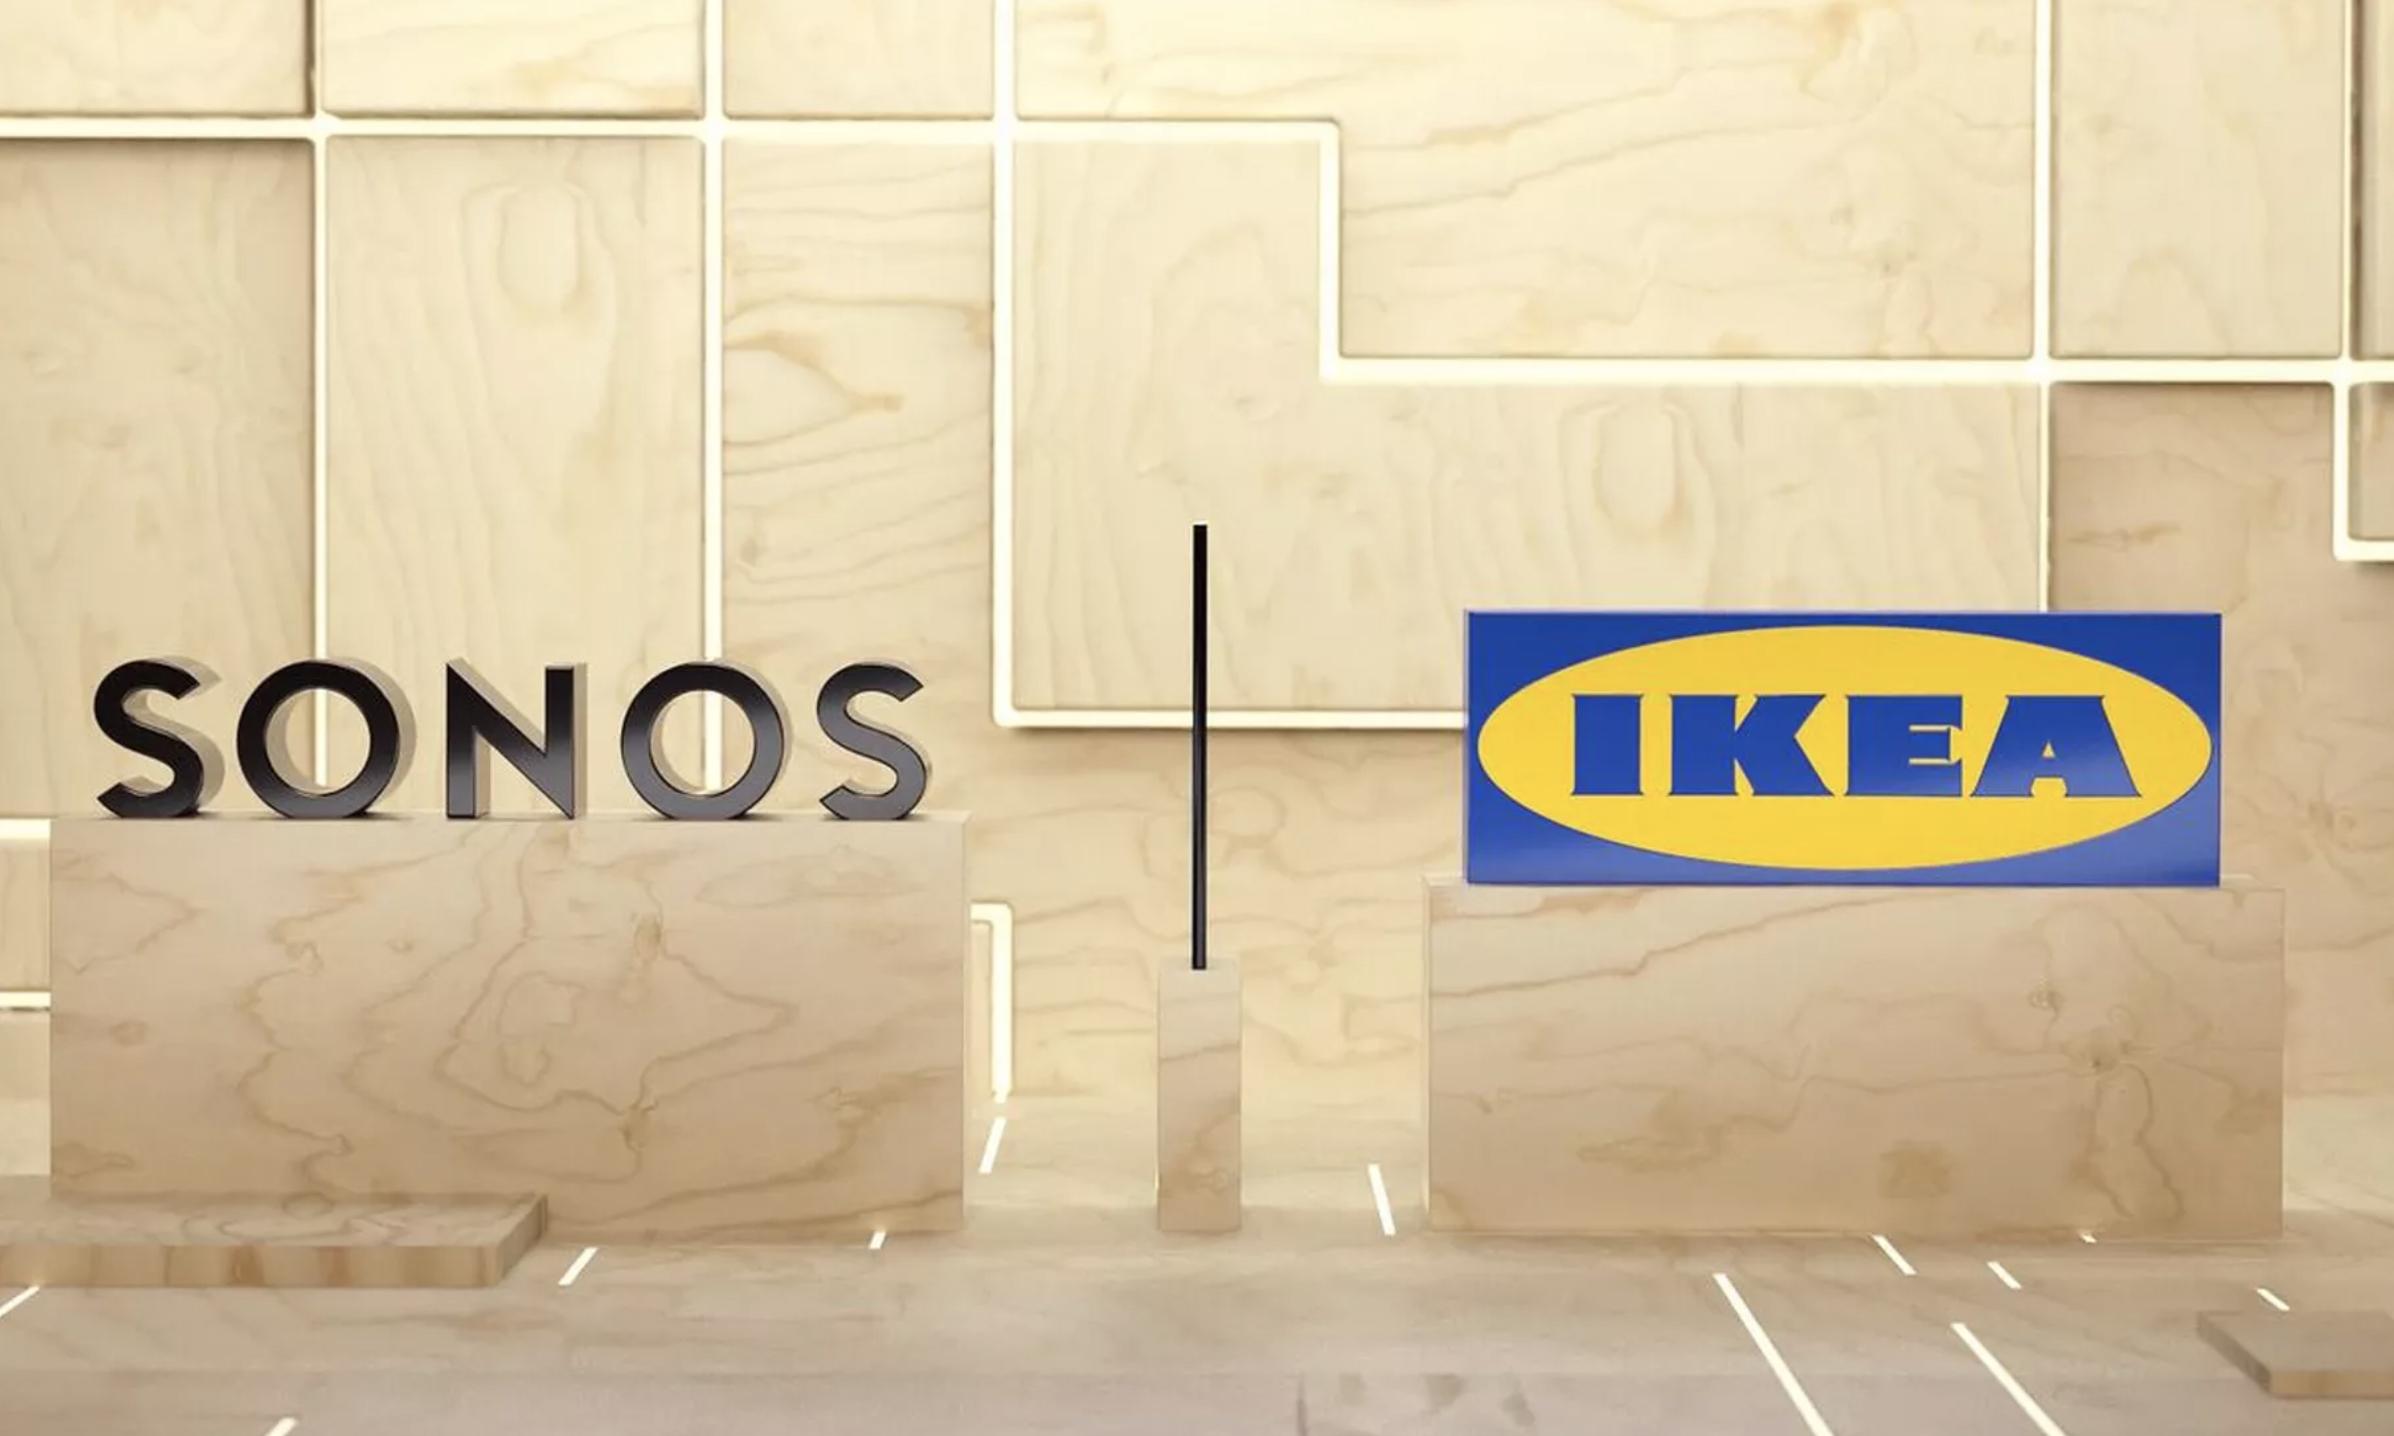 IKEA 与音响品牌 Sonos 宣布合作,加快智能家居步伐